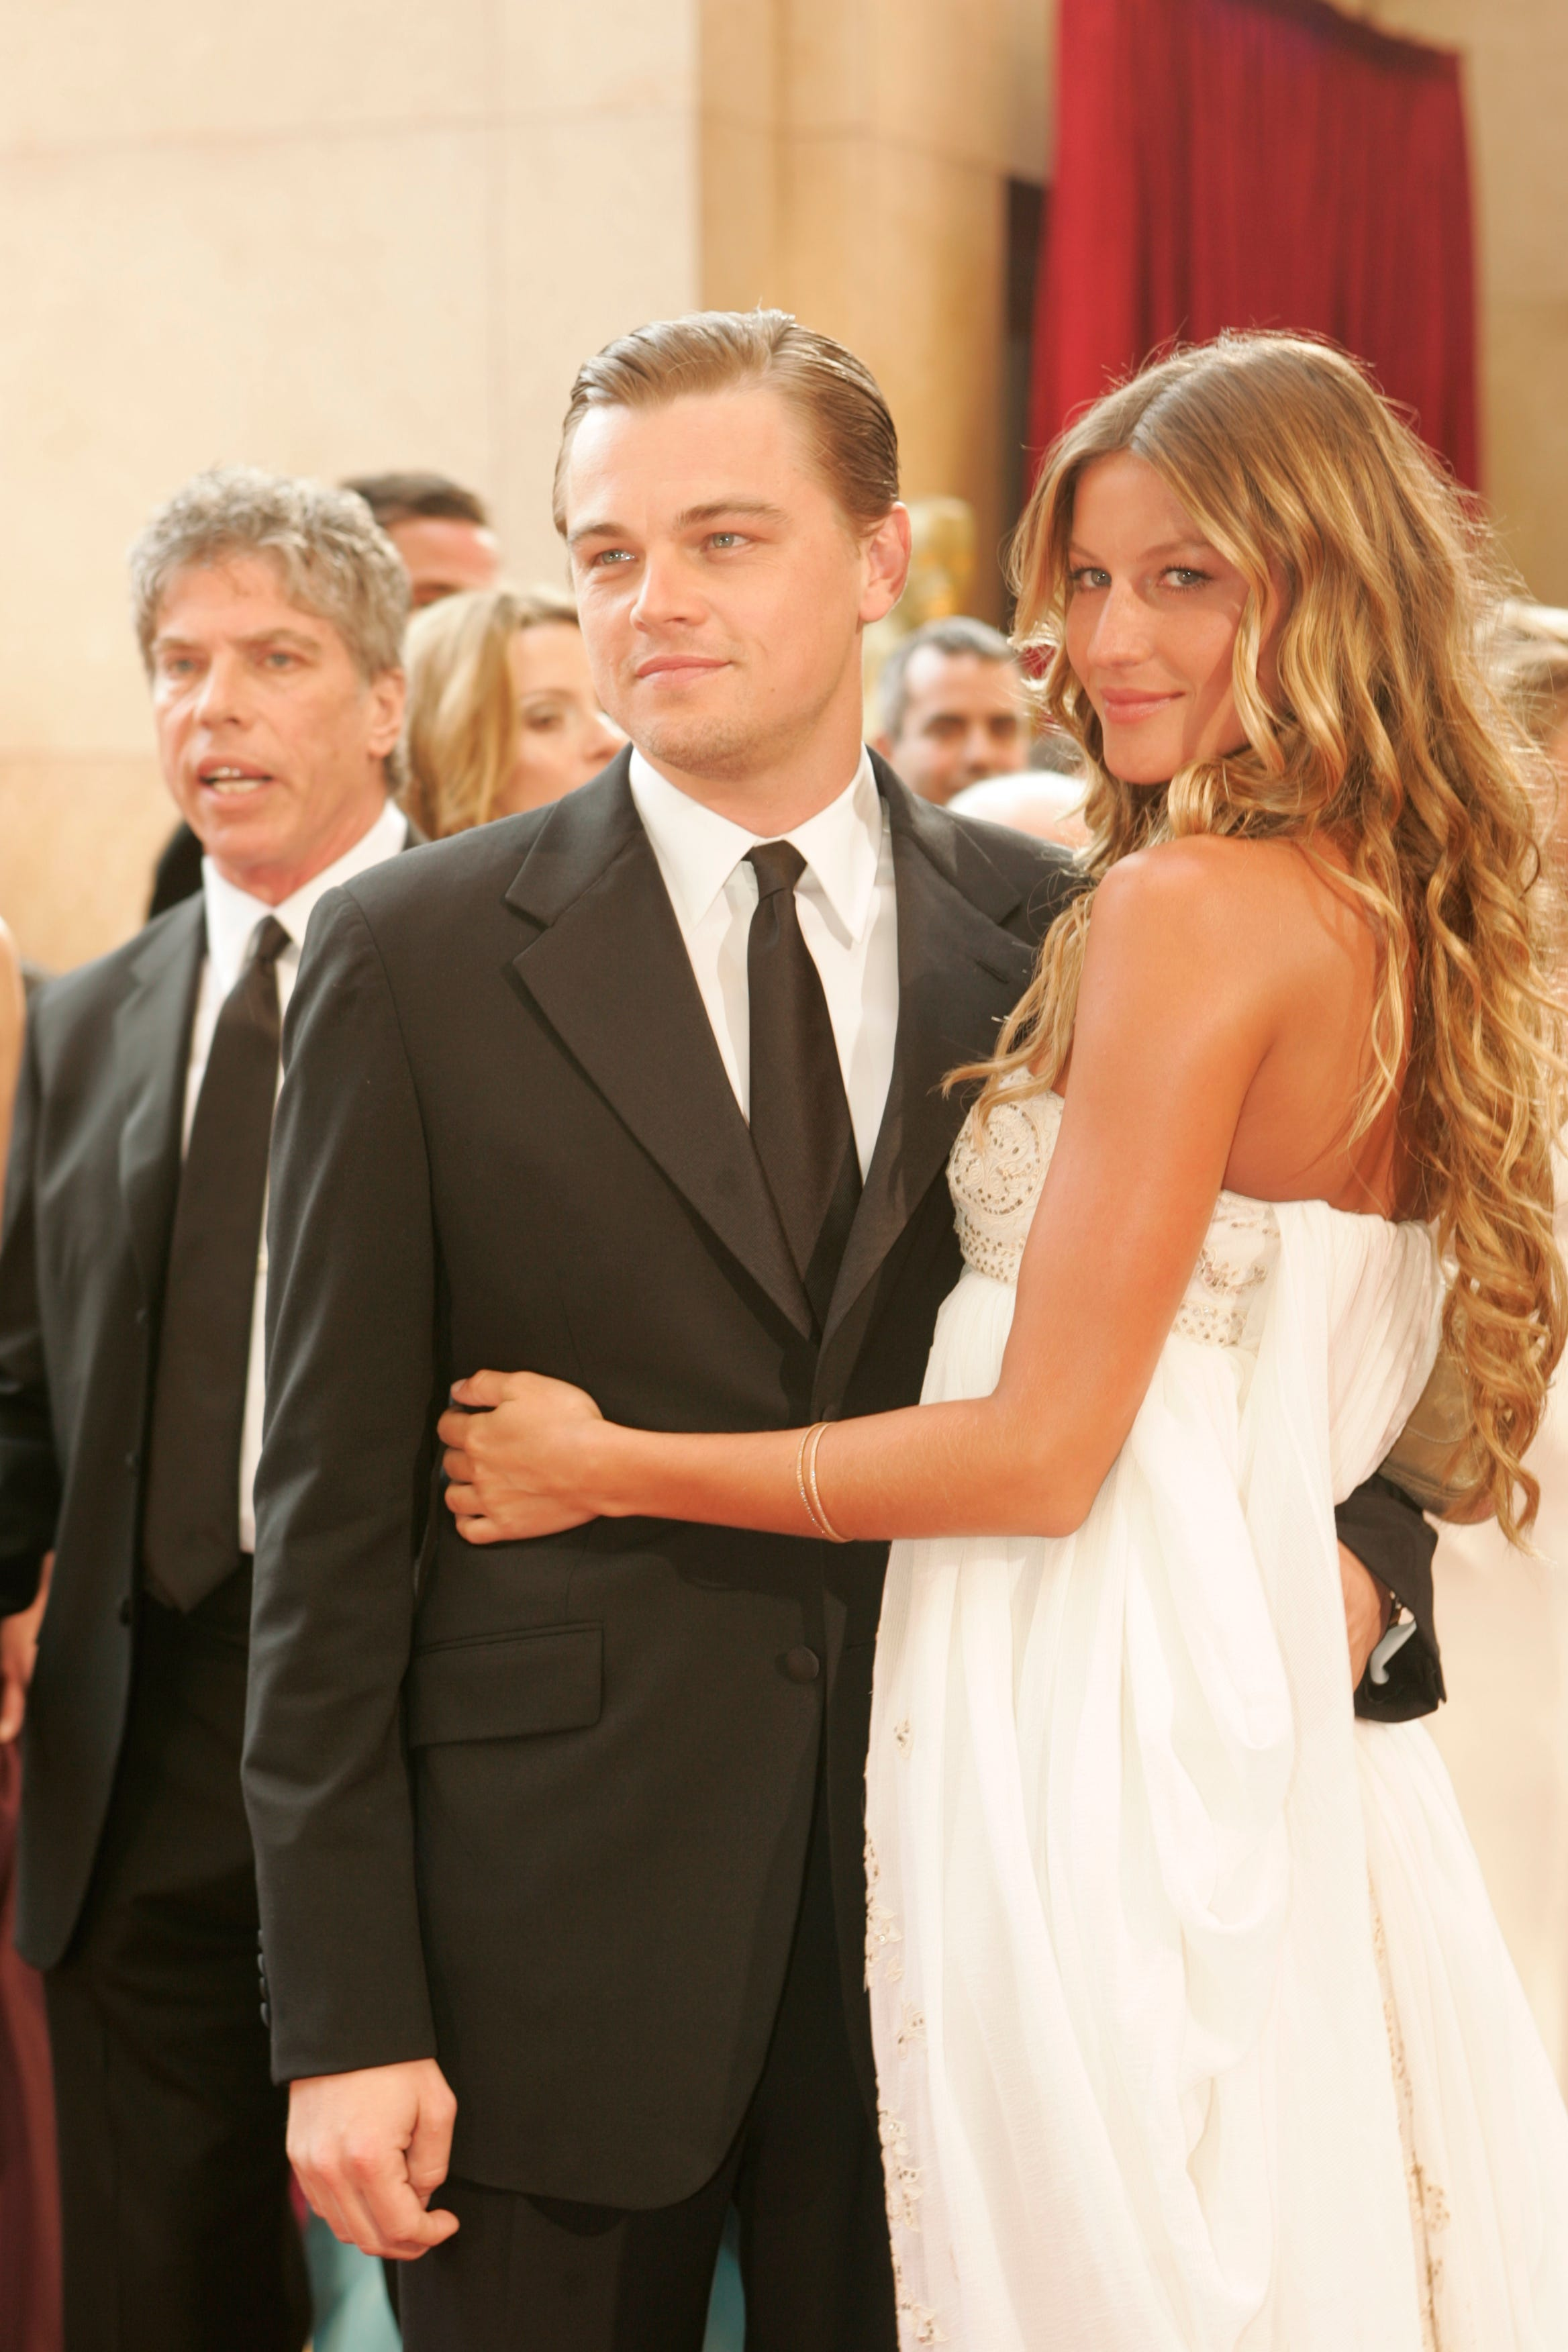 Gisele Bündchen finally reveals why she and Leonardo DiCaprio broke up